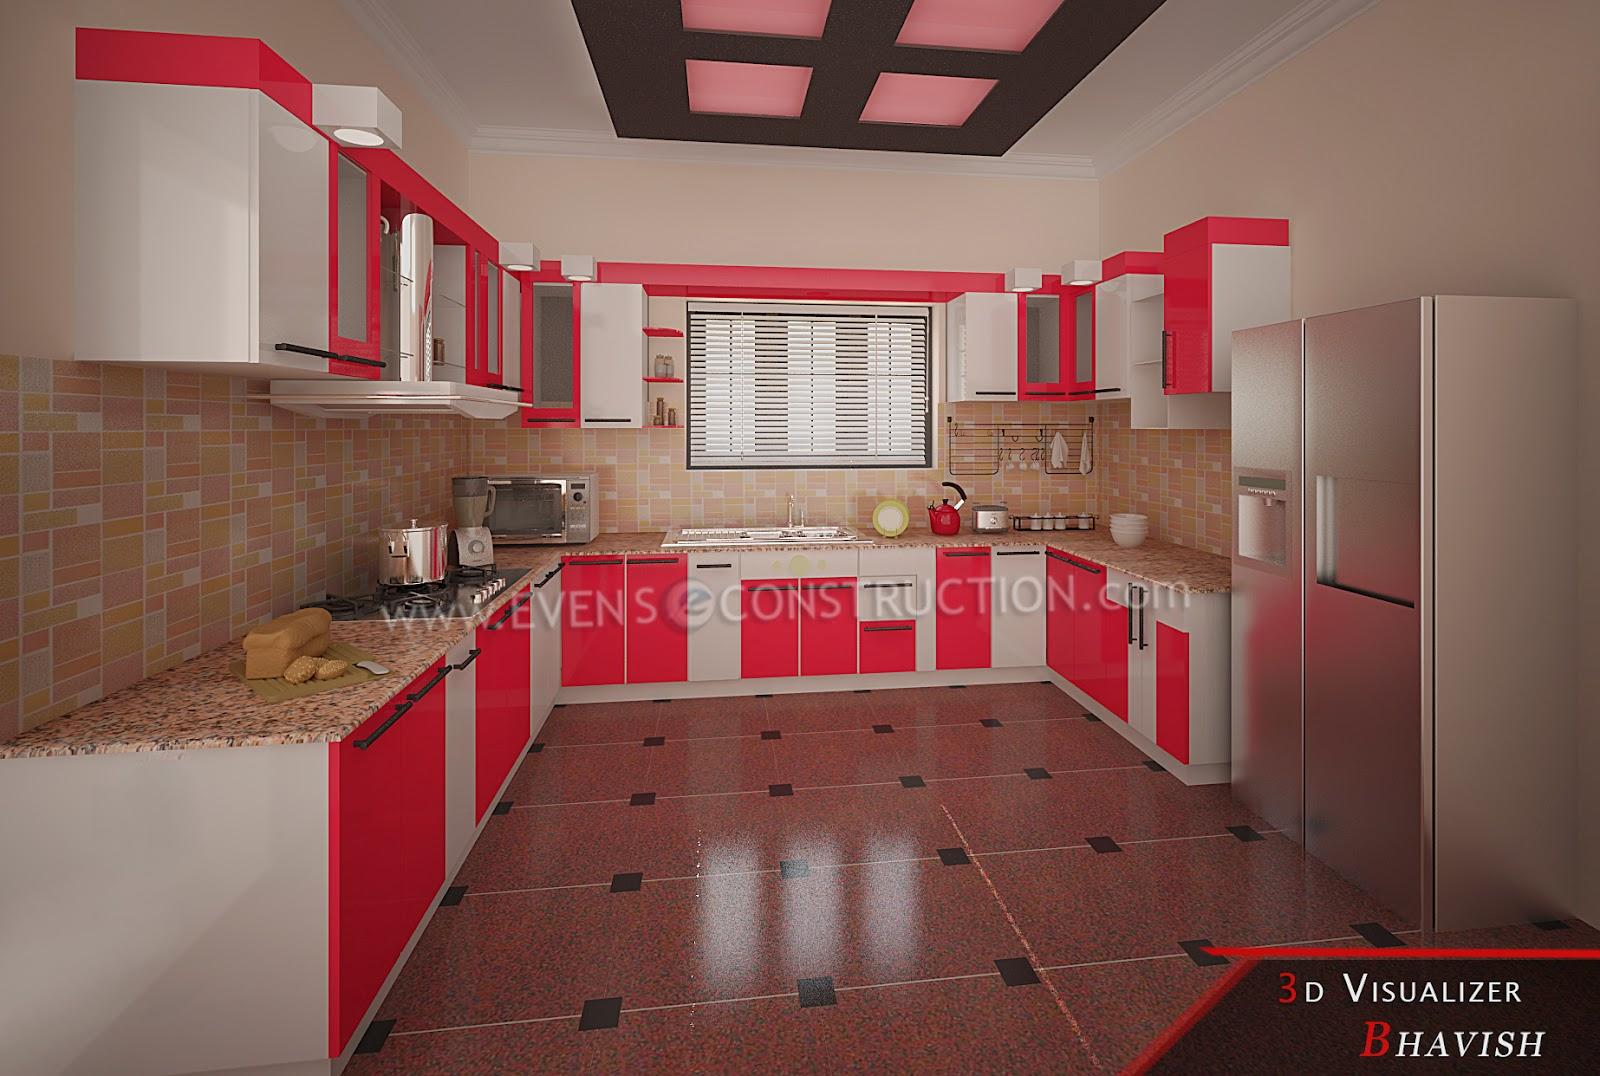 Kitchen Design Kerala Houses Evens Construction Pvt Ltd: Modern Kitchen  Interior For Kerala House